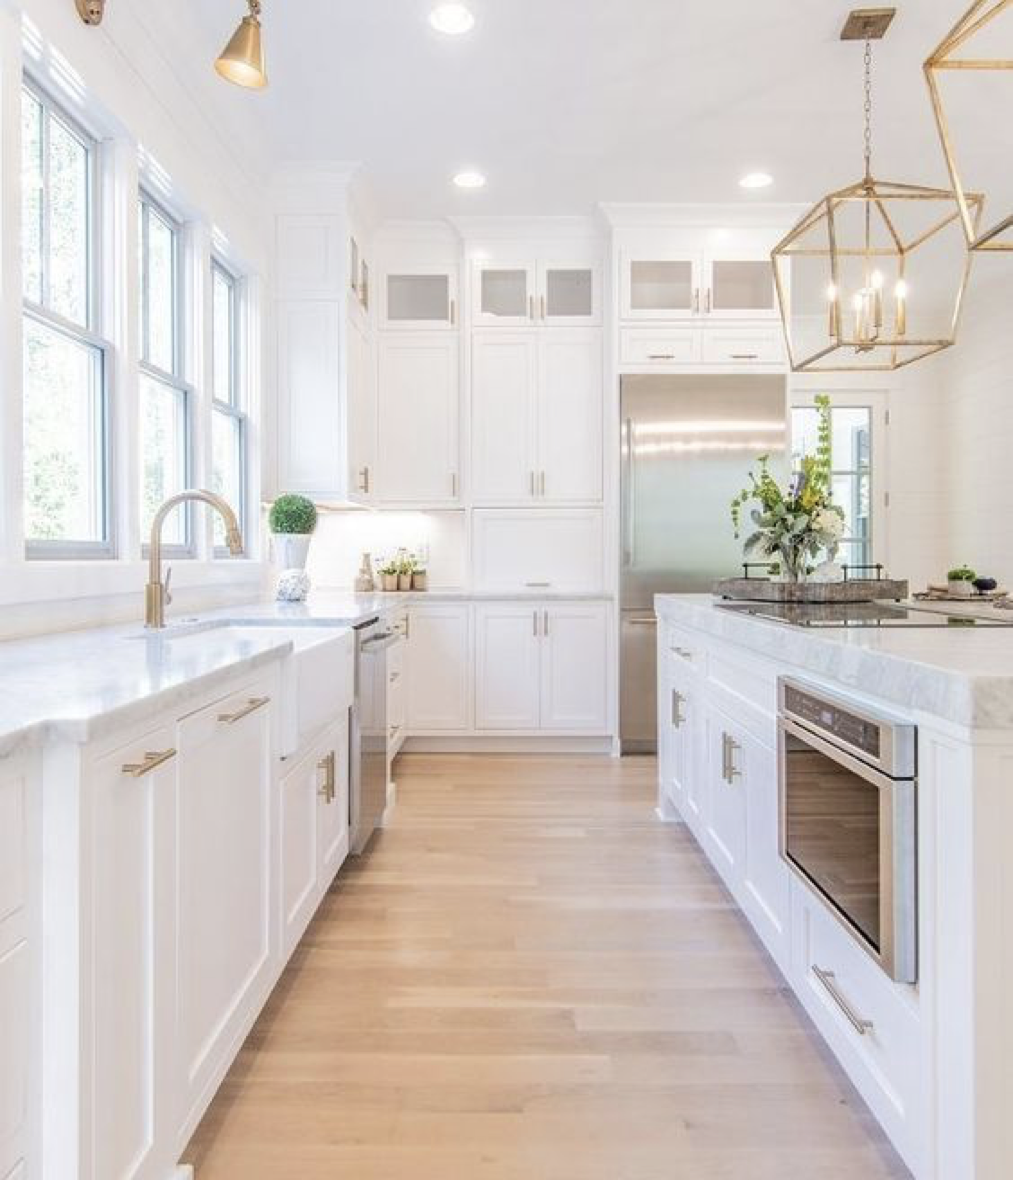 Desain Dapur Minimalis Serba Putih – source: pinterest.com